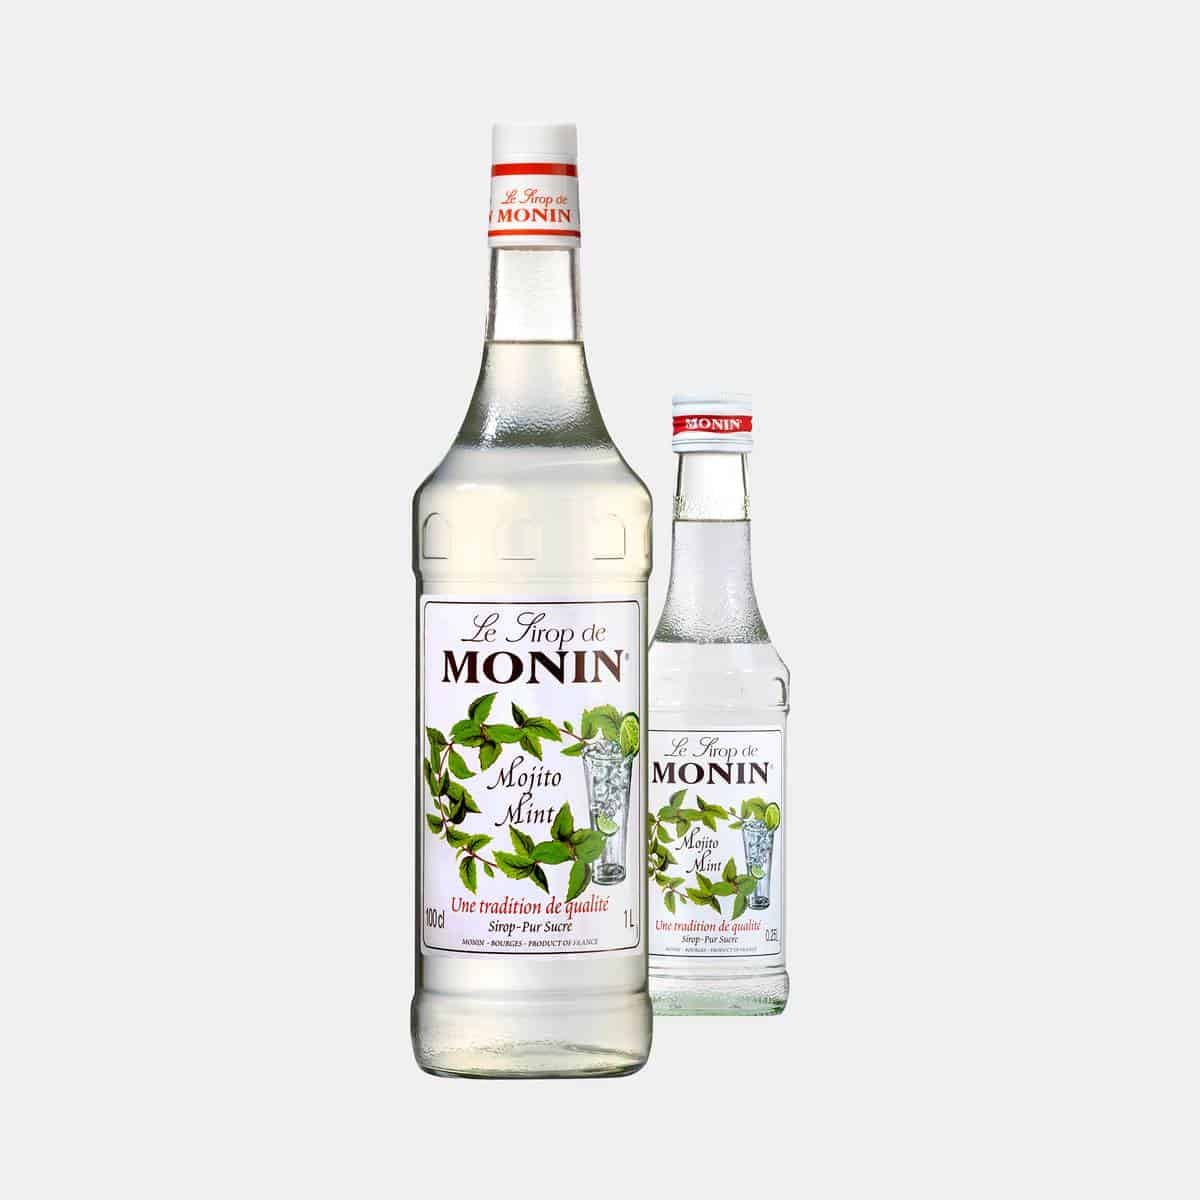 Monin Mojito Mint Syrup